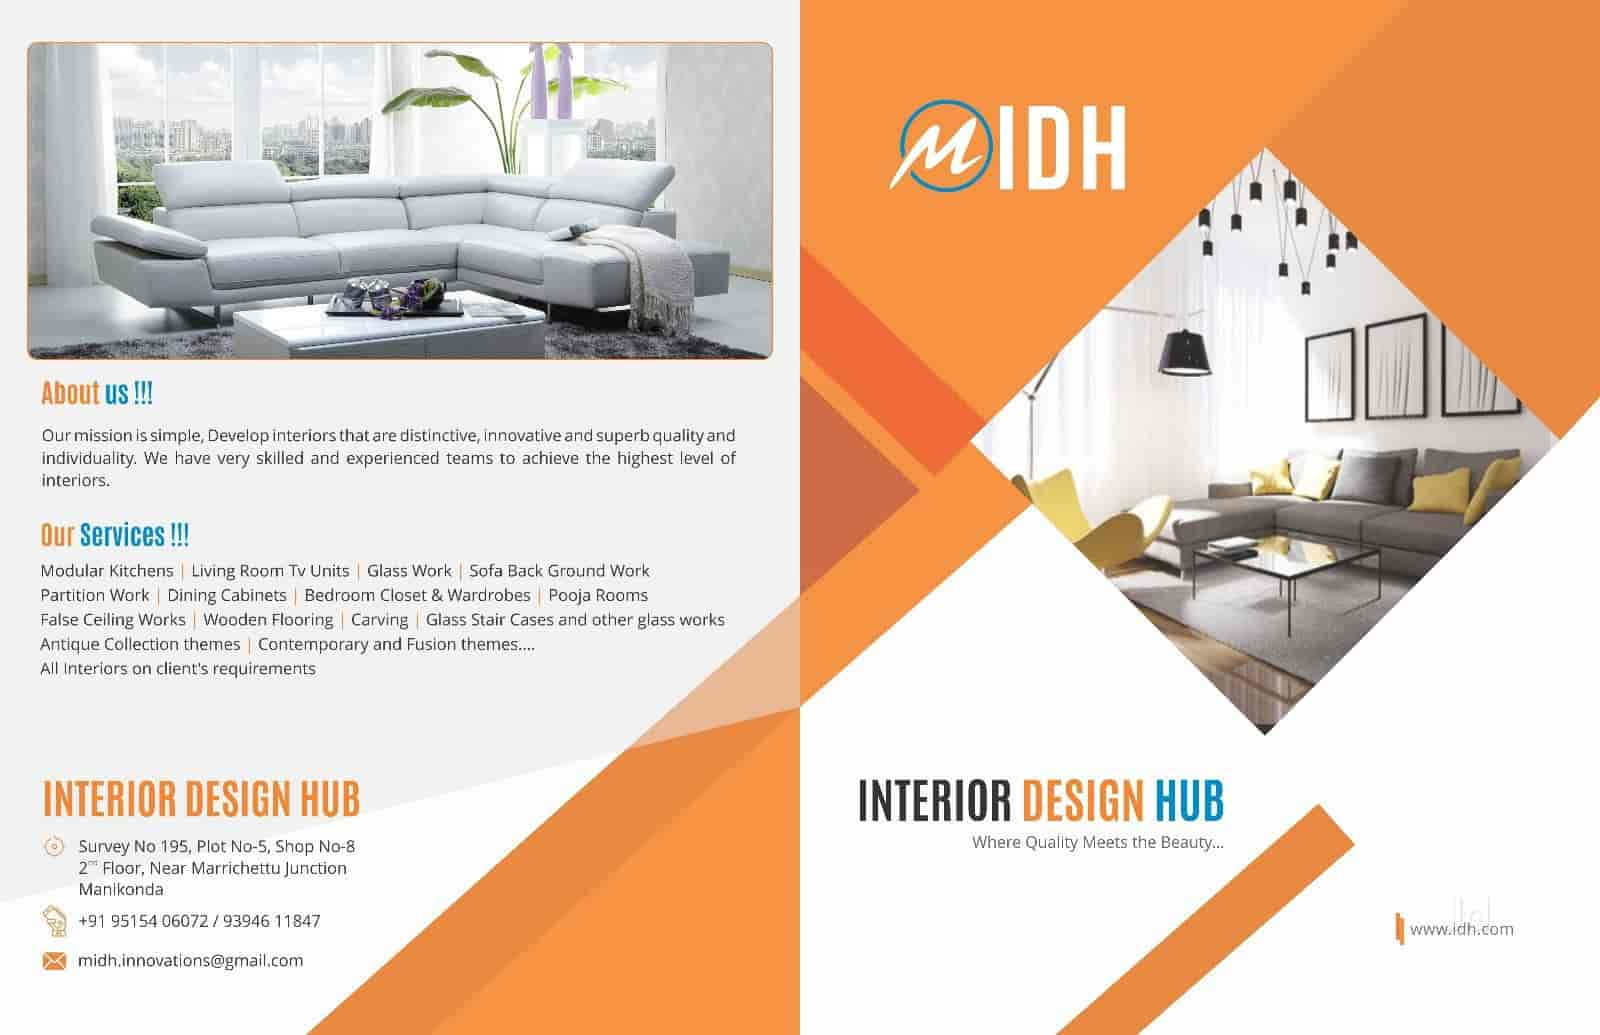 Brochure interior design hub photos manikonda hyderabad interior designers